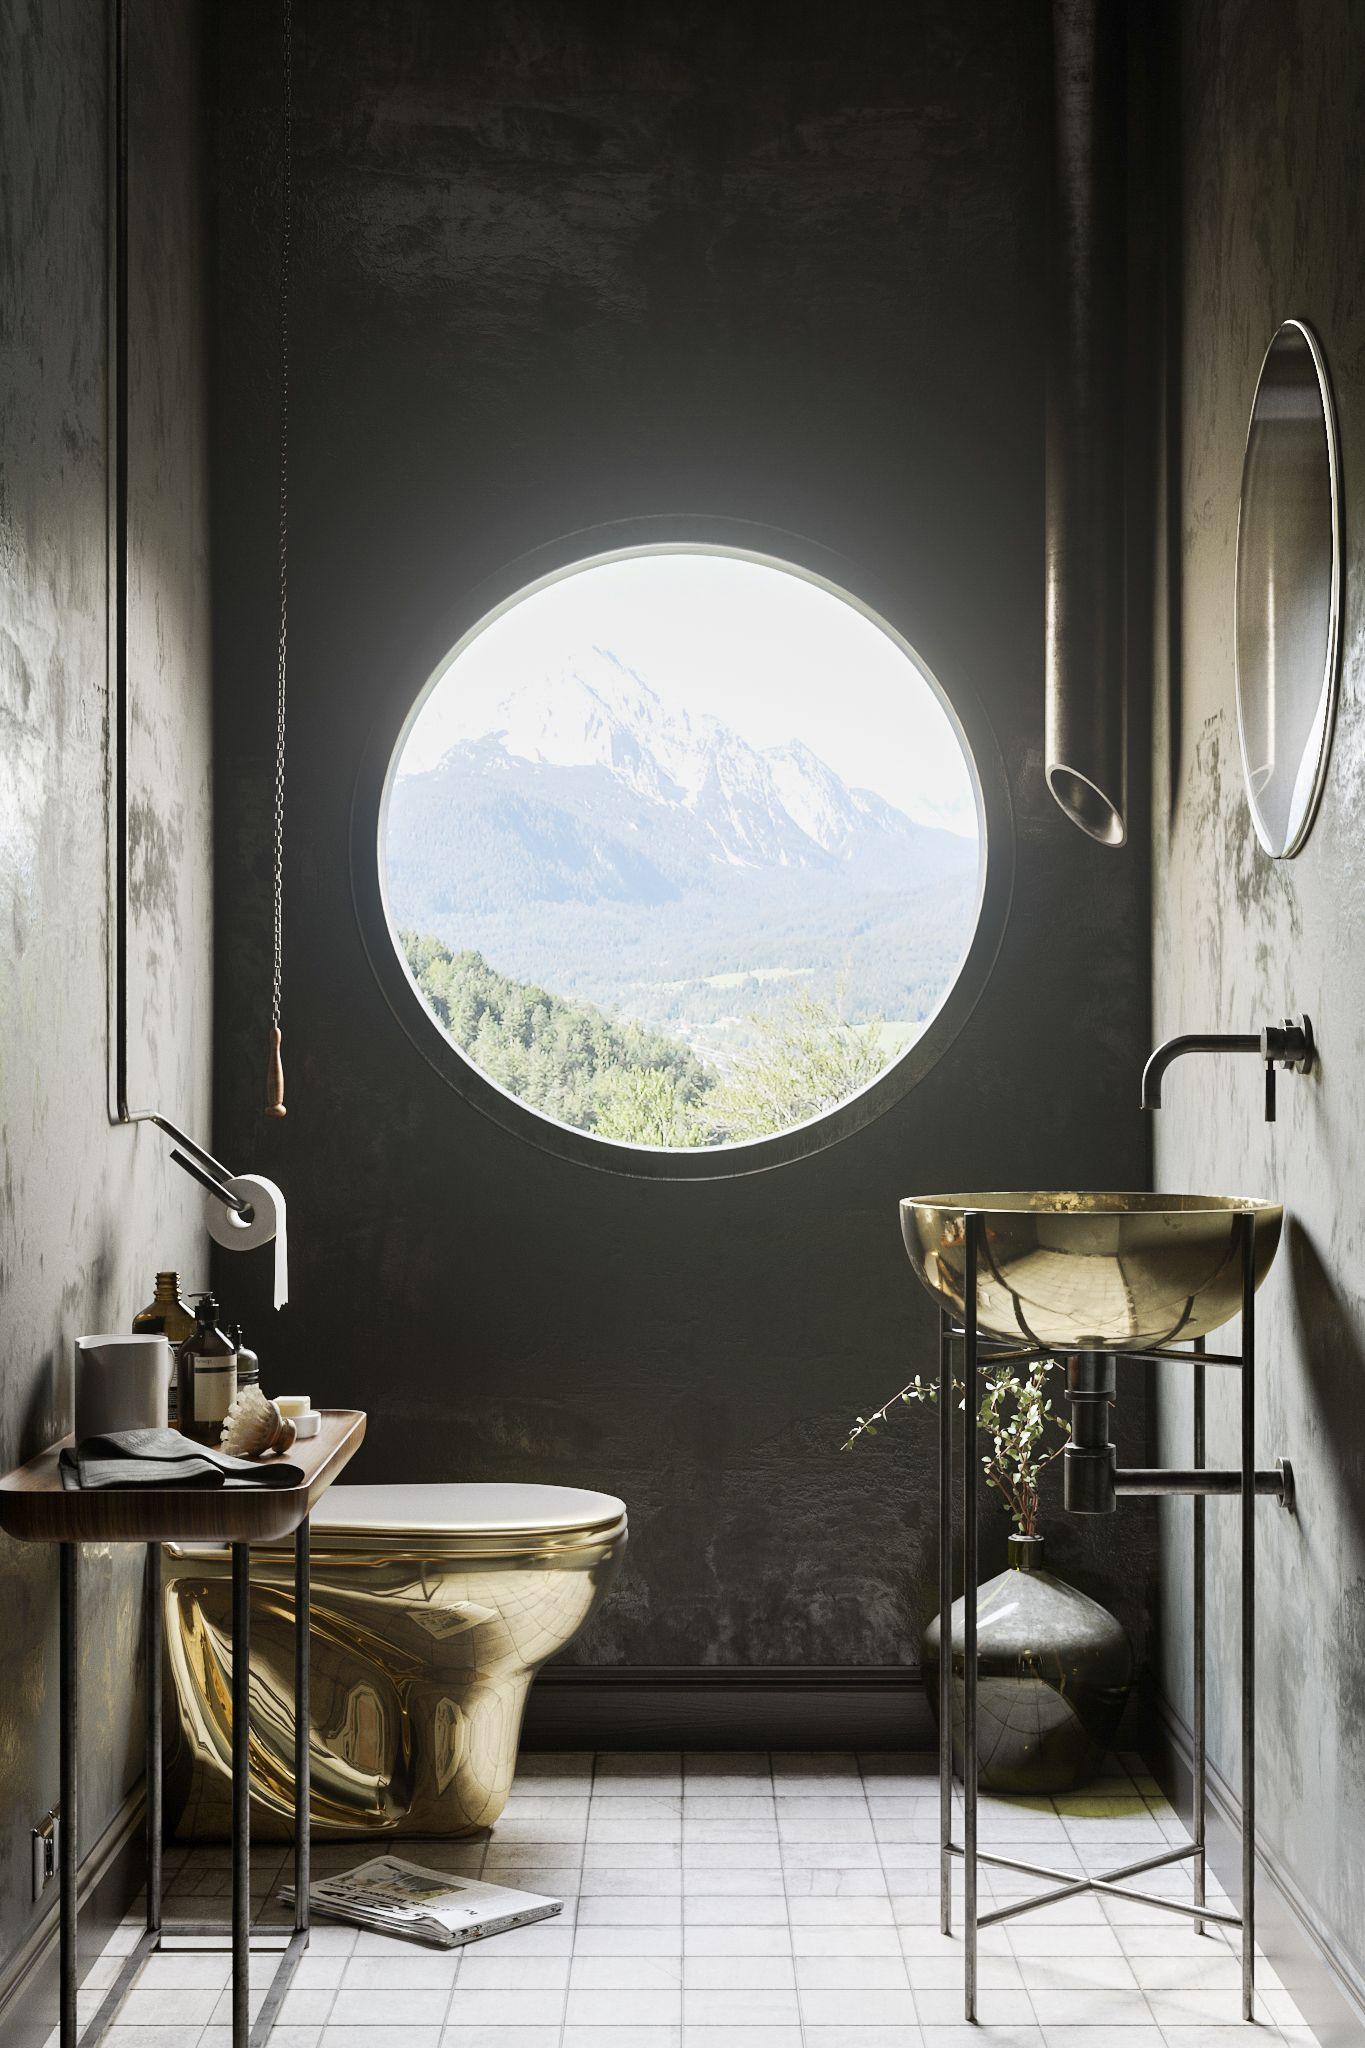 cocoon modern bathroom inspiration bycocoon com round window rh pinterest com